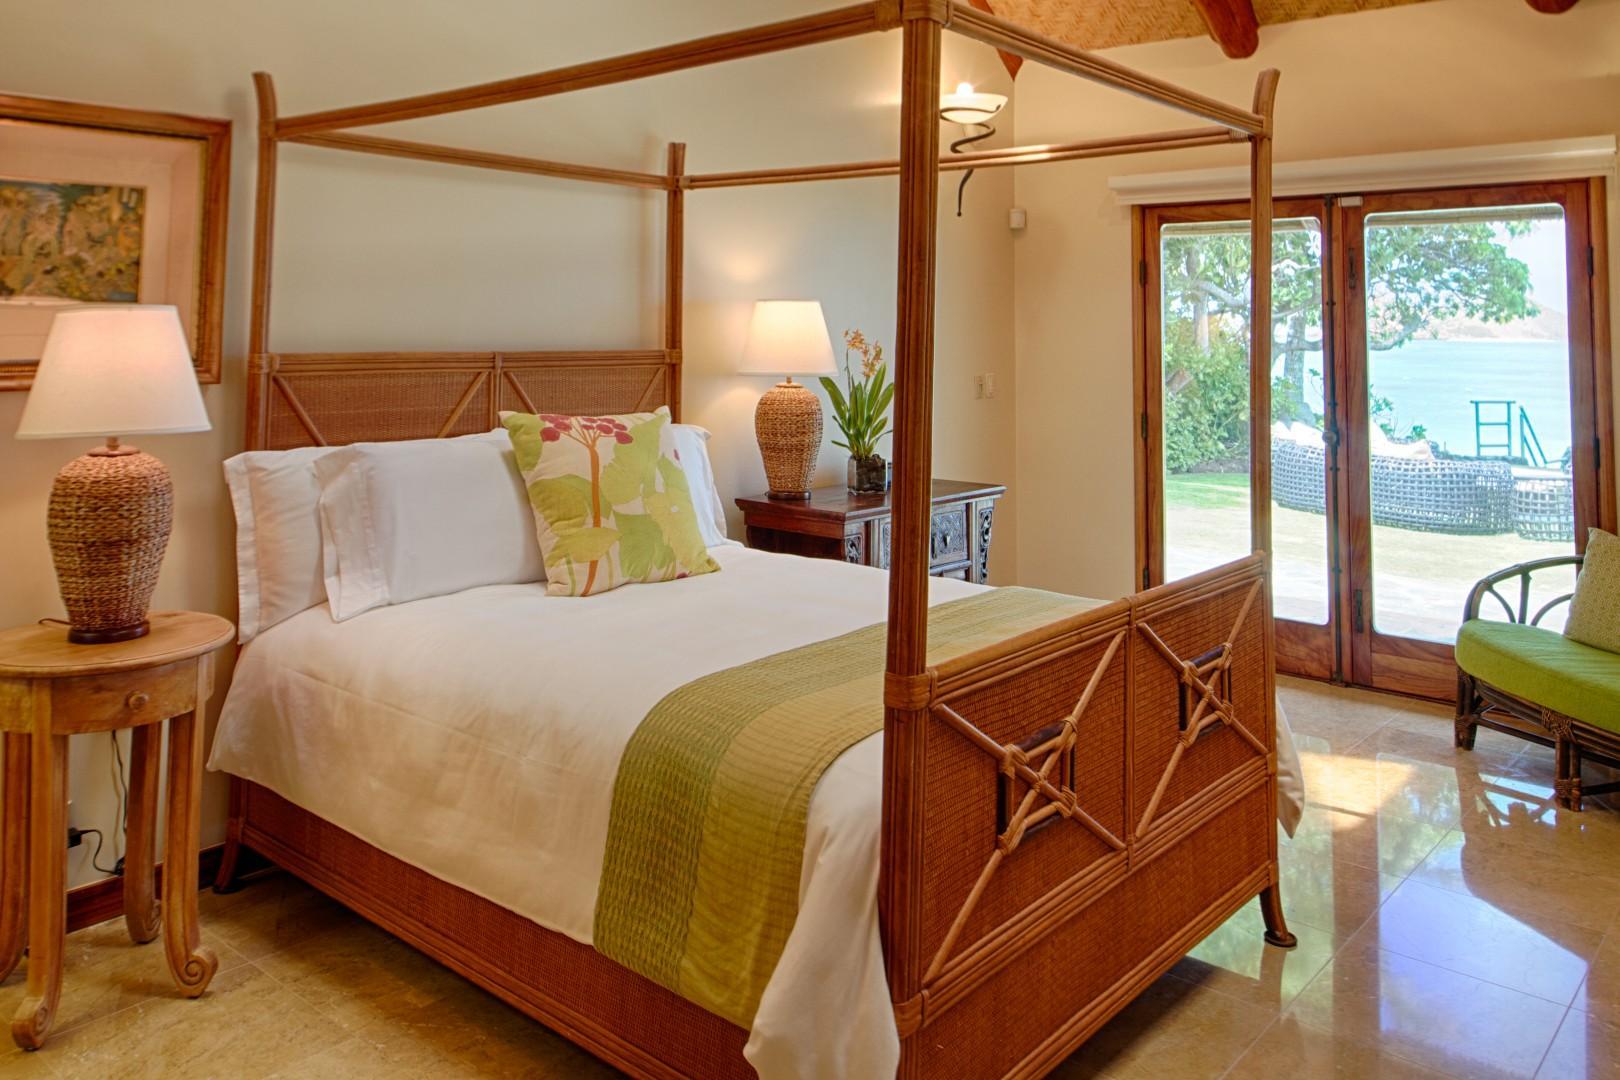 Bedroom 4 in Guest House